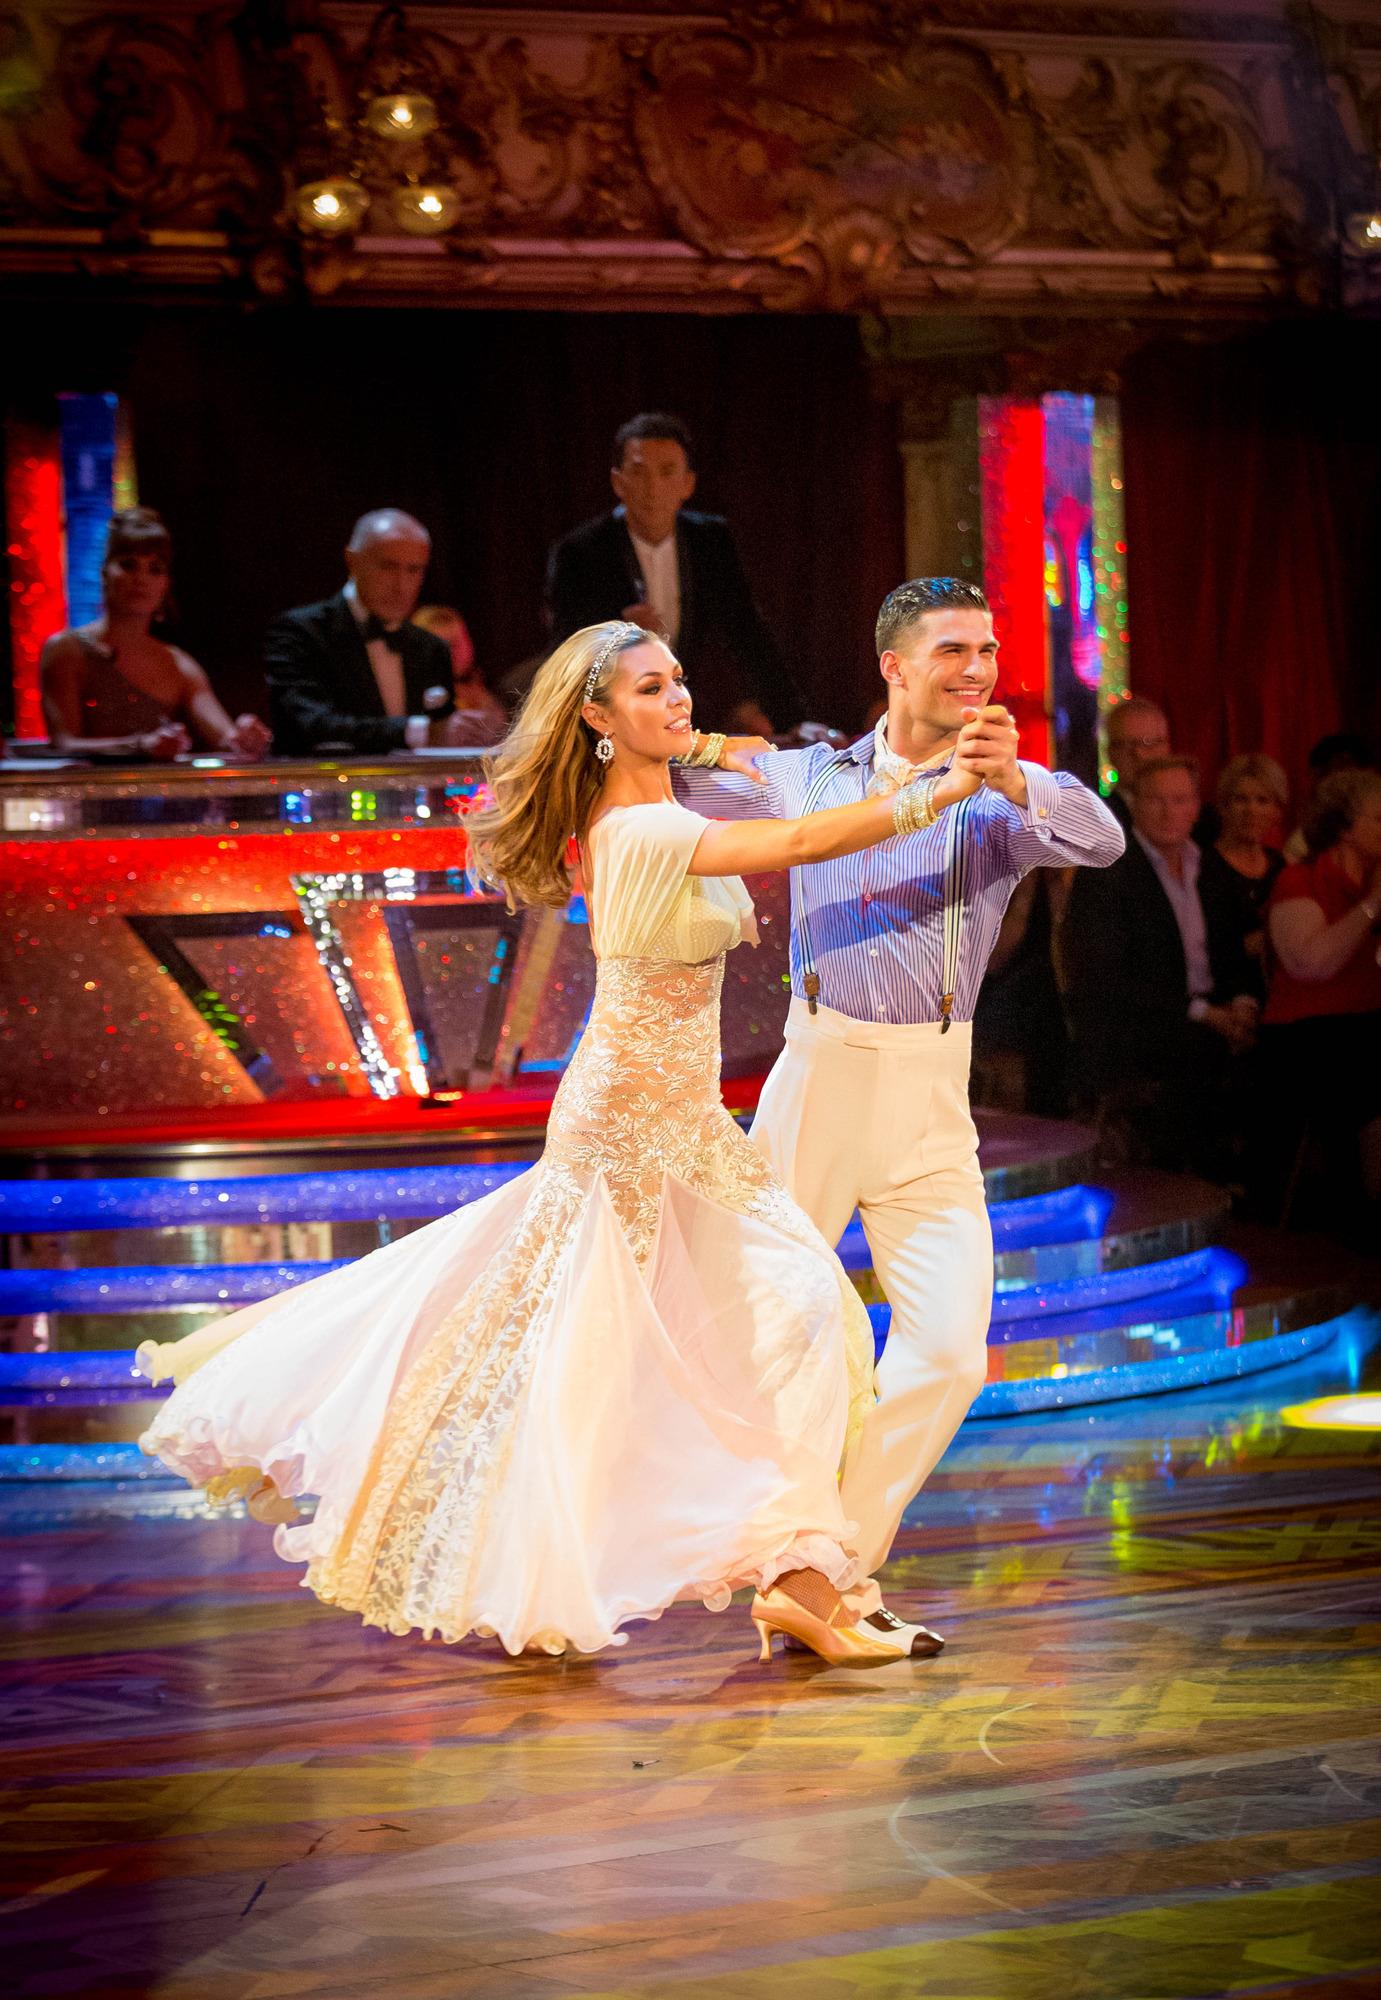 Strictly come dancing by Filiz Elgezdi on Waltz, My